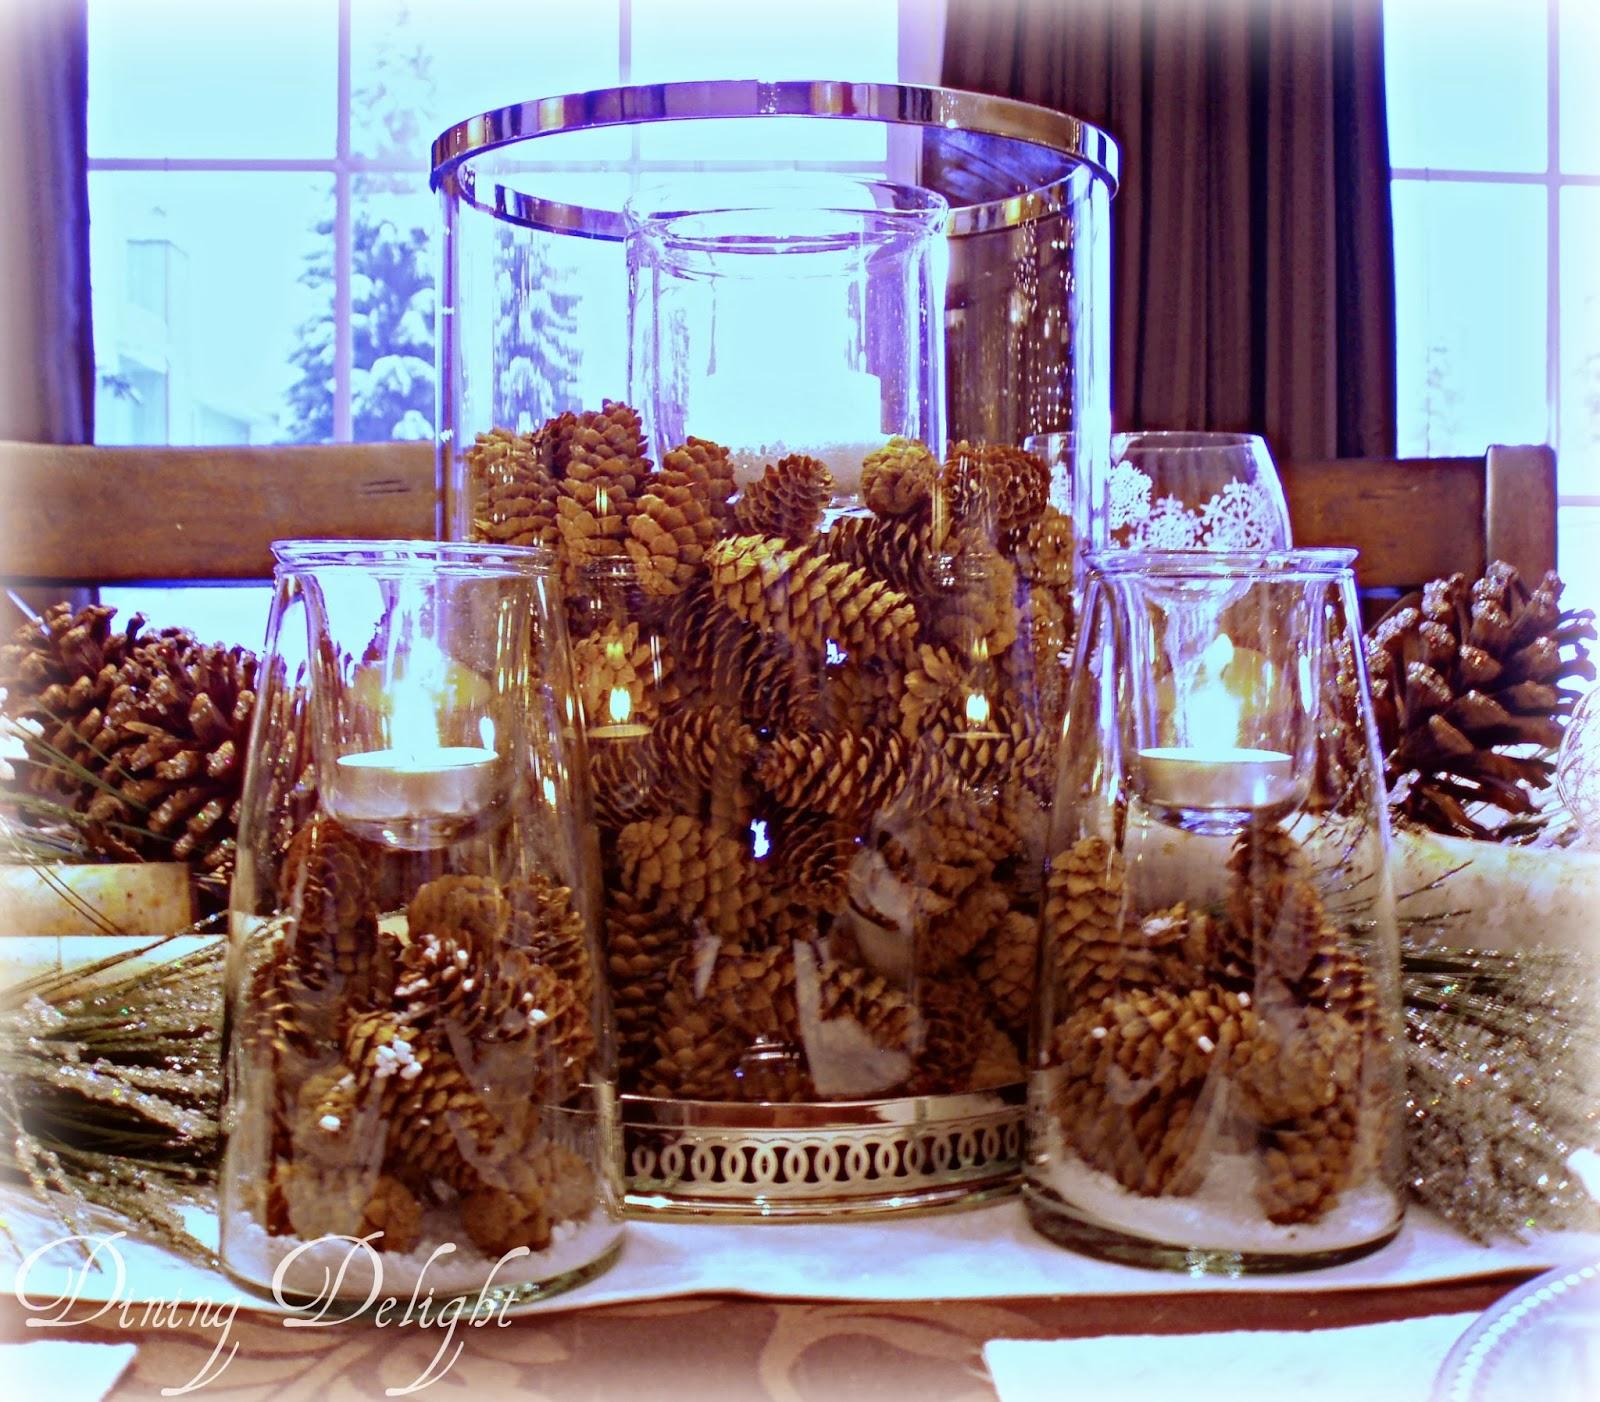 Dining Delight Birch Winter Tablescape